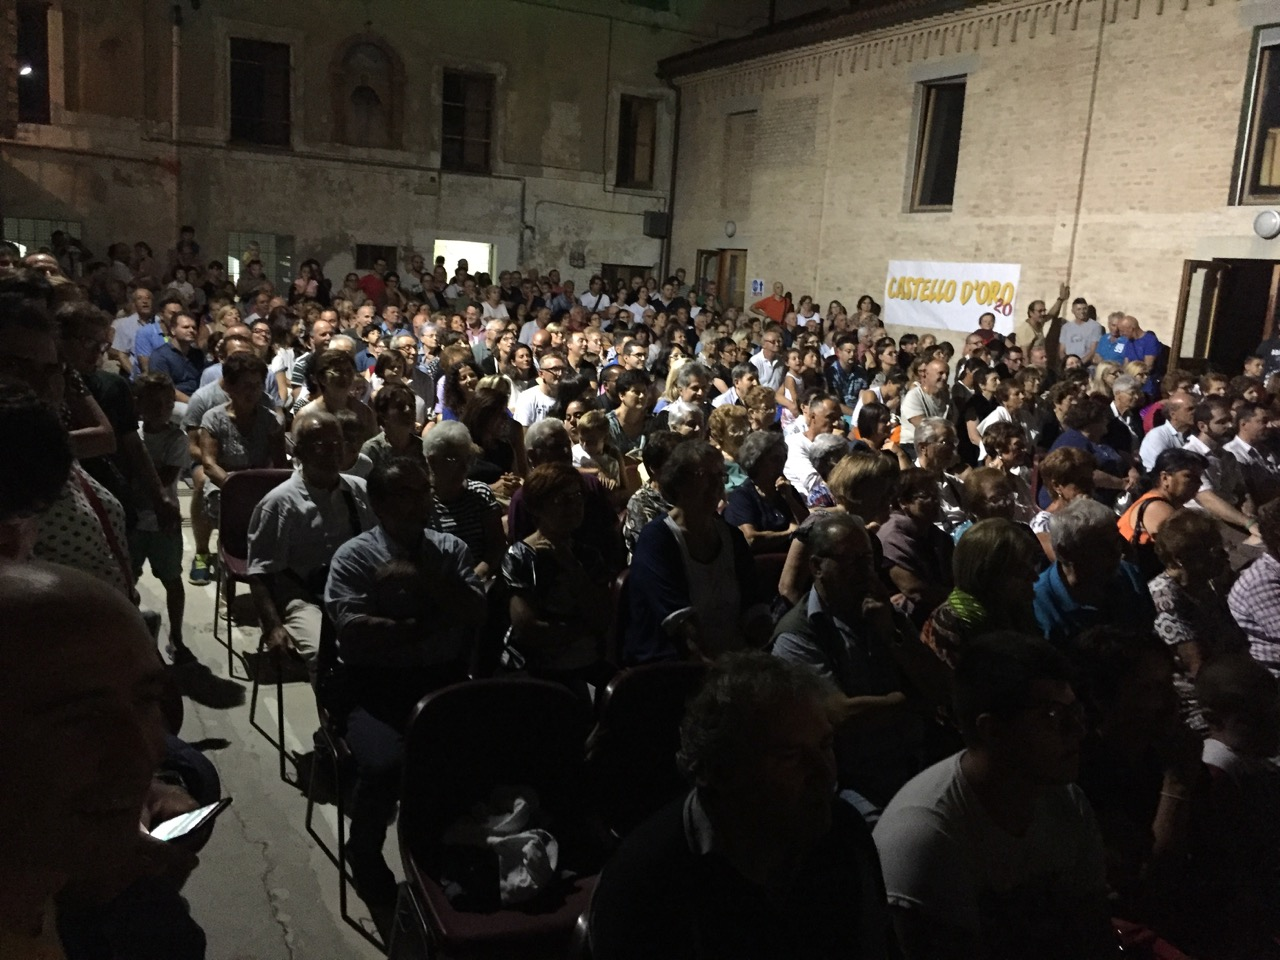 16-07-23 CASTELLO D'ORO 2016 - 17.jpg